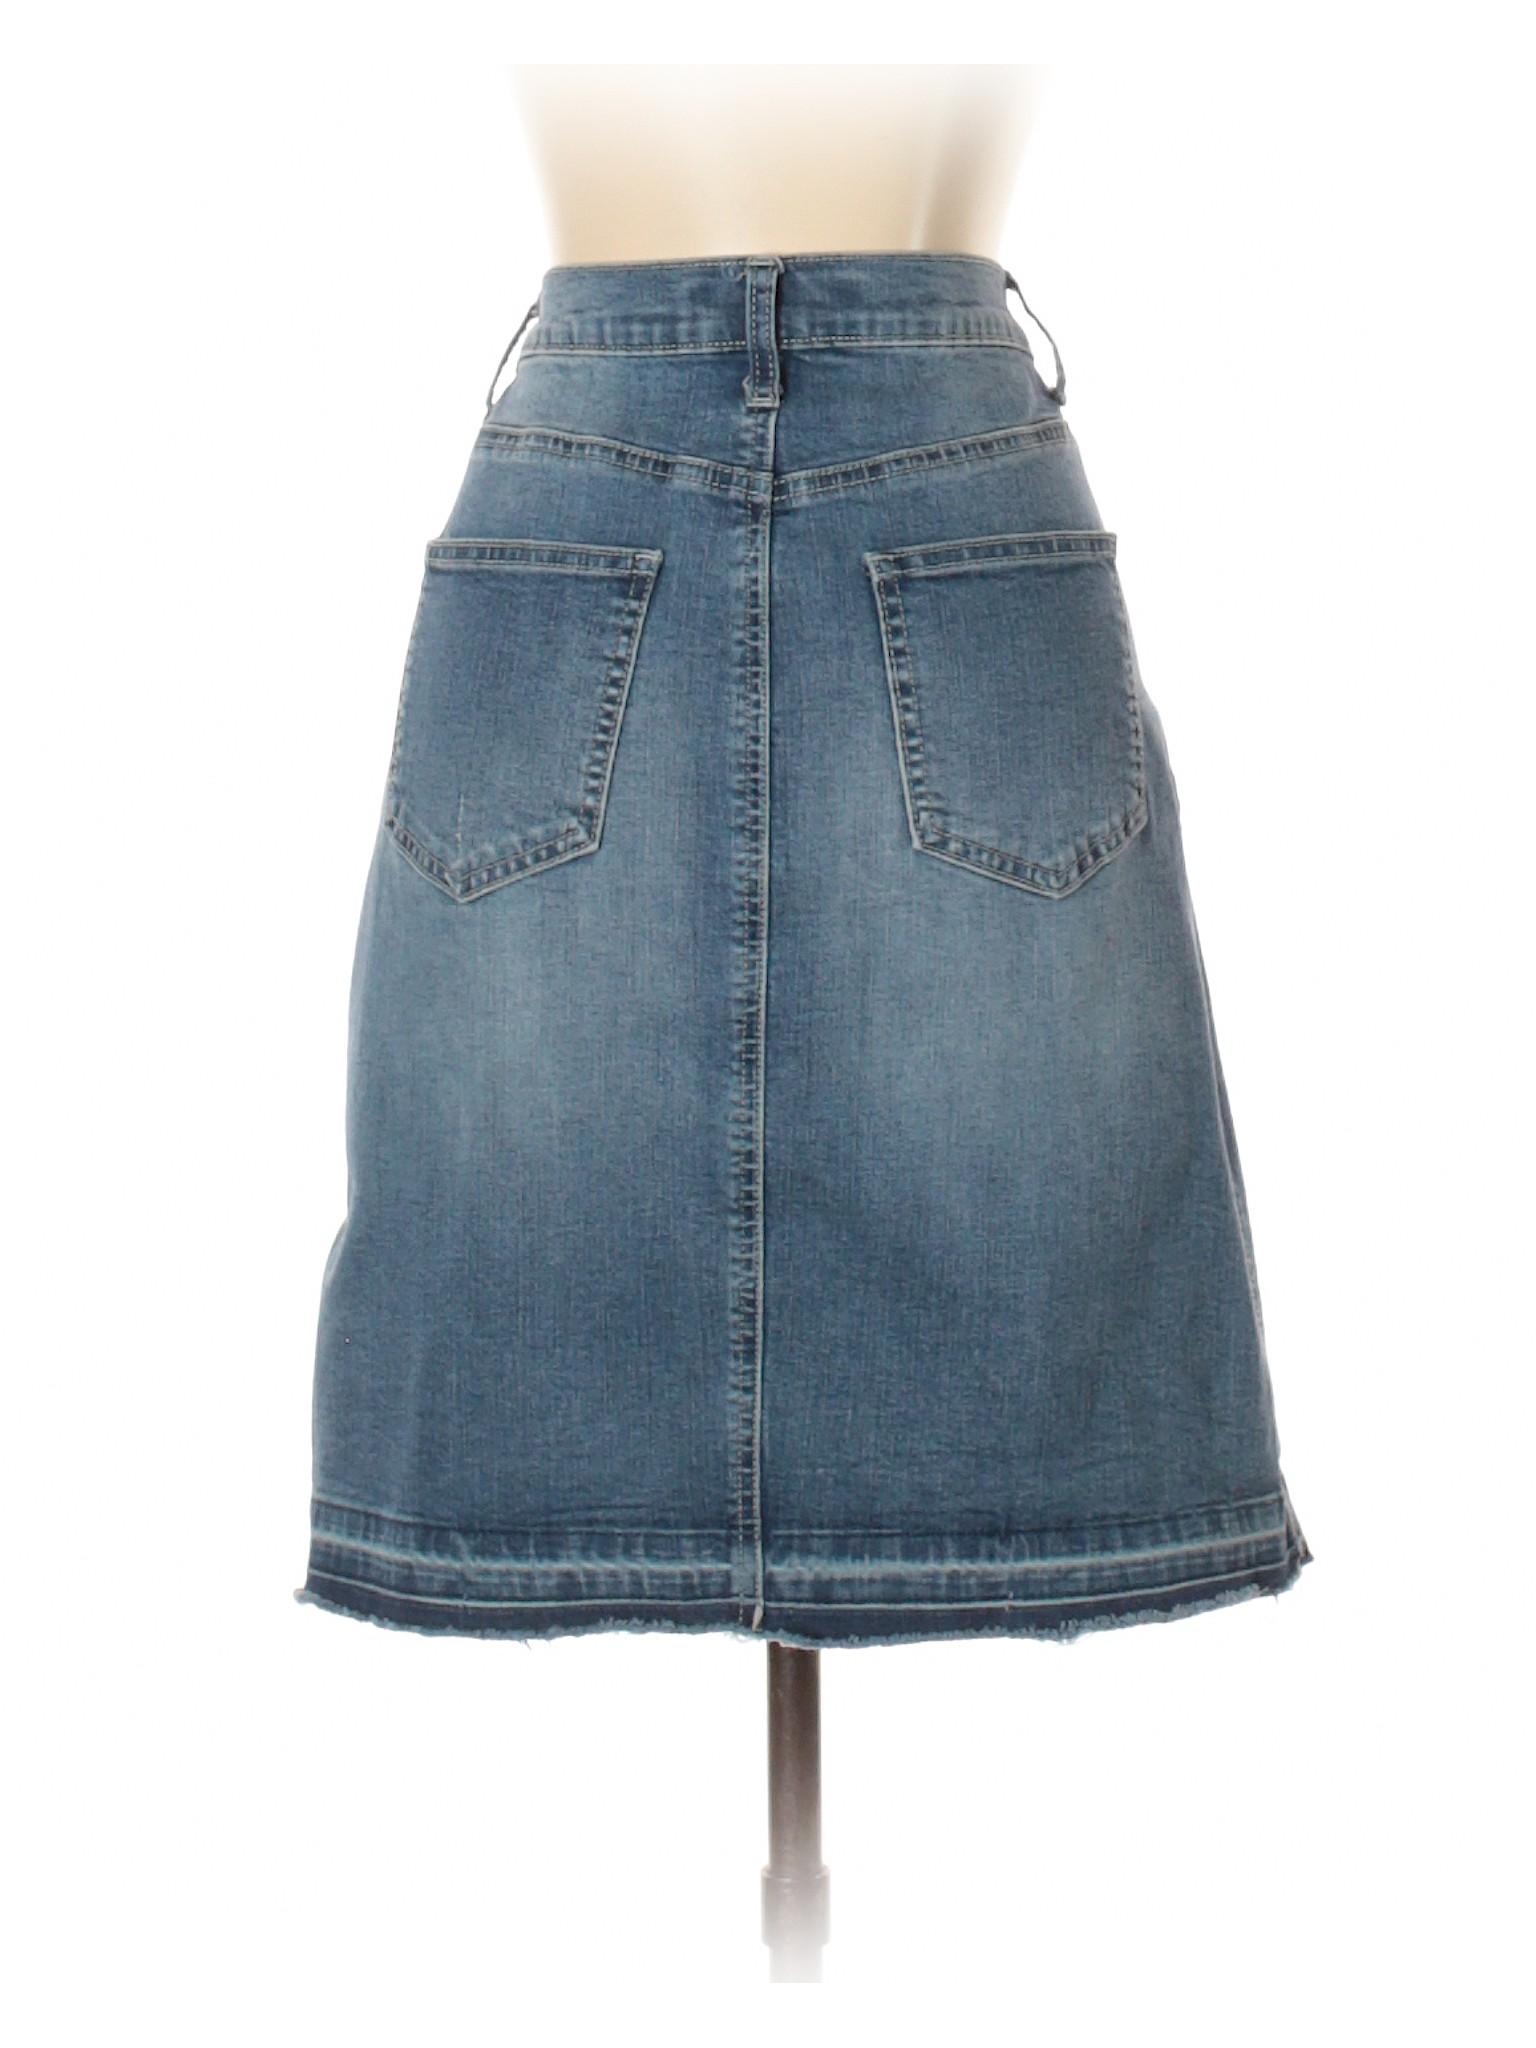 661b83df1b Cato Solid Blue Denim Skirt Size 6 - 59% off | thredUP